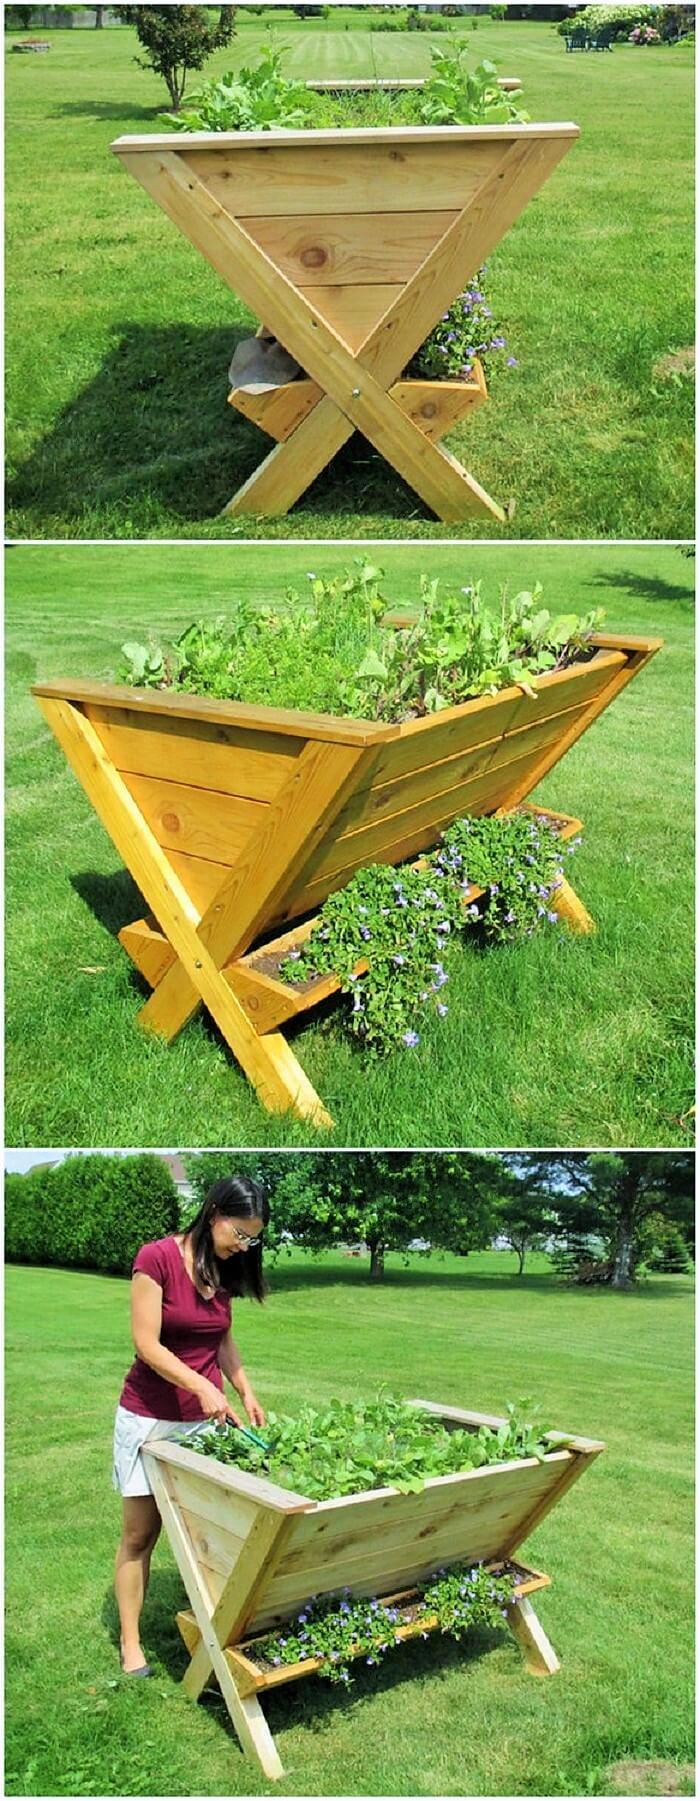 DIY-Wodden-Pallet-Furniture-Projects-16 (2)